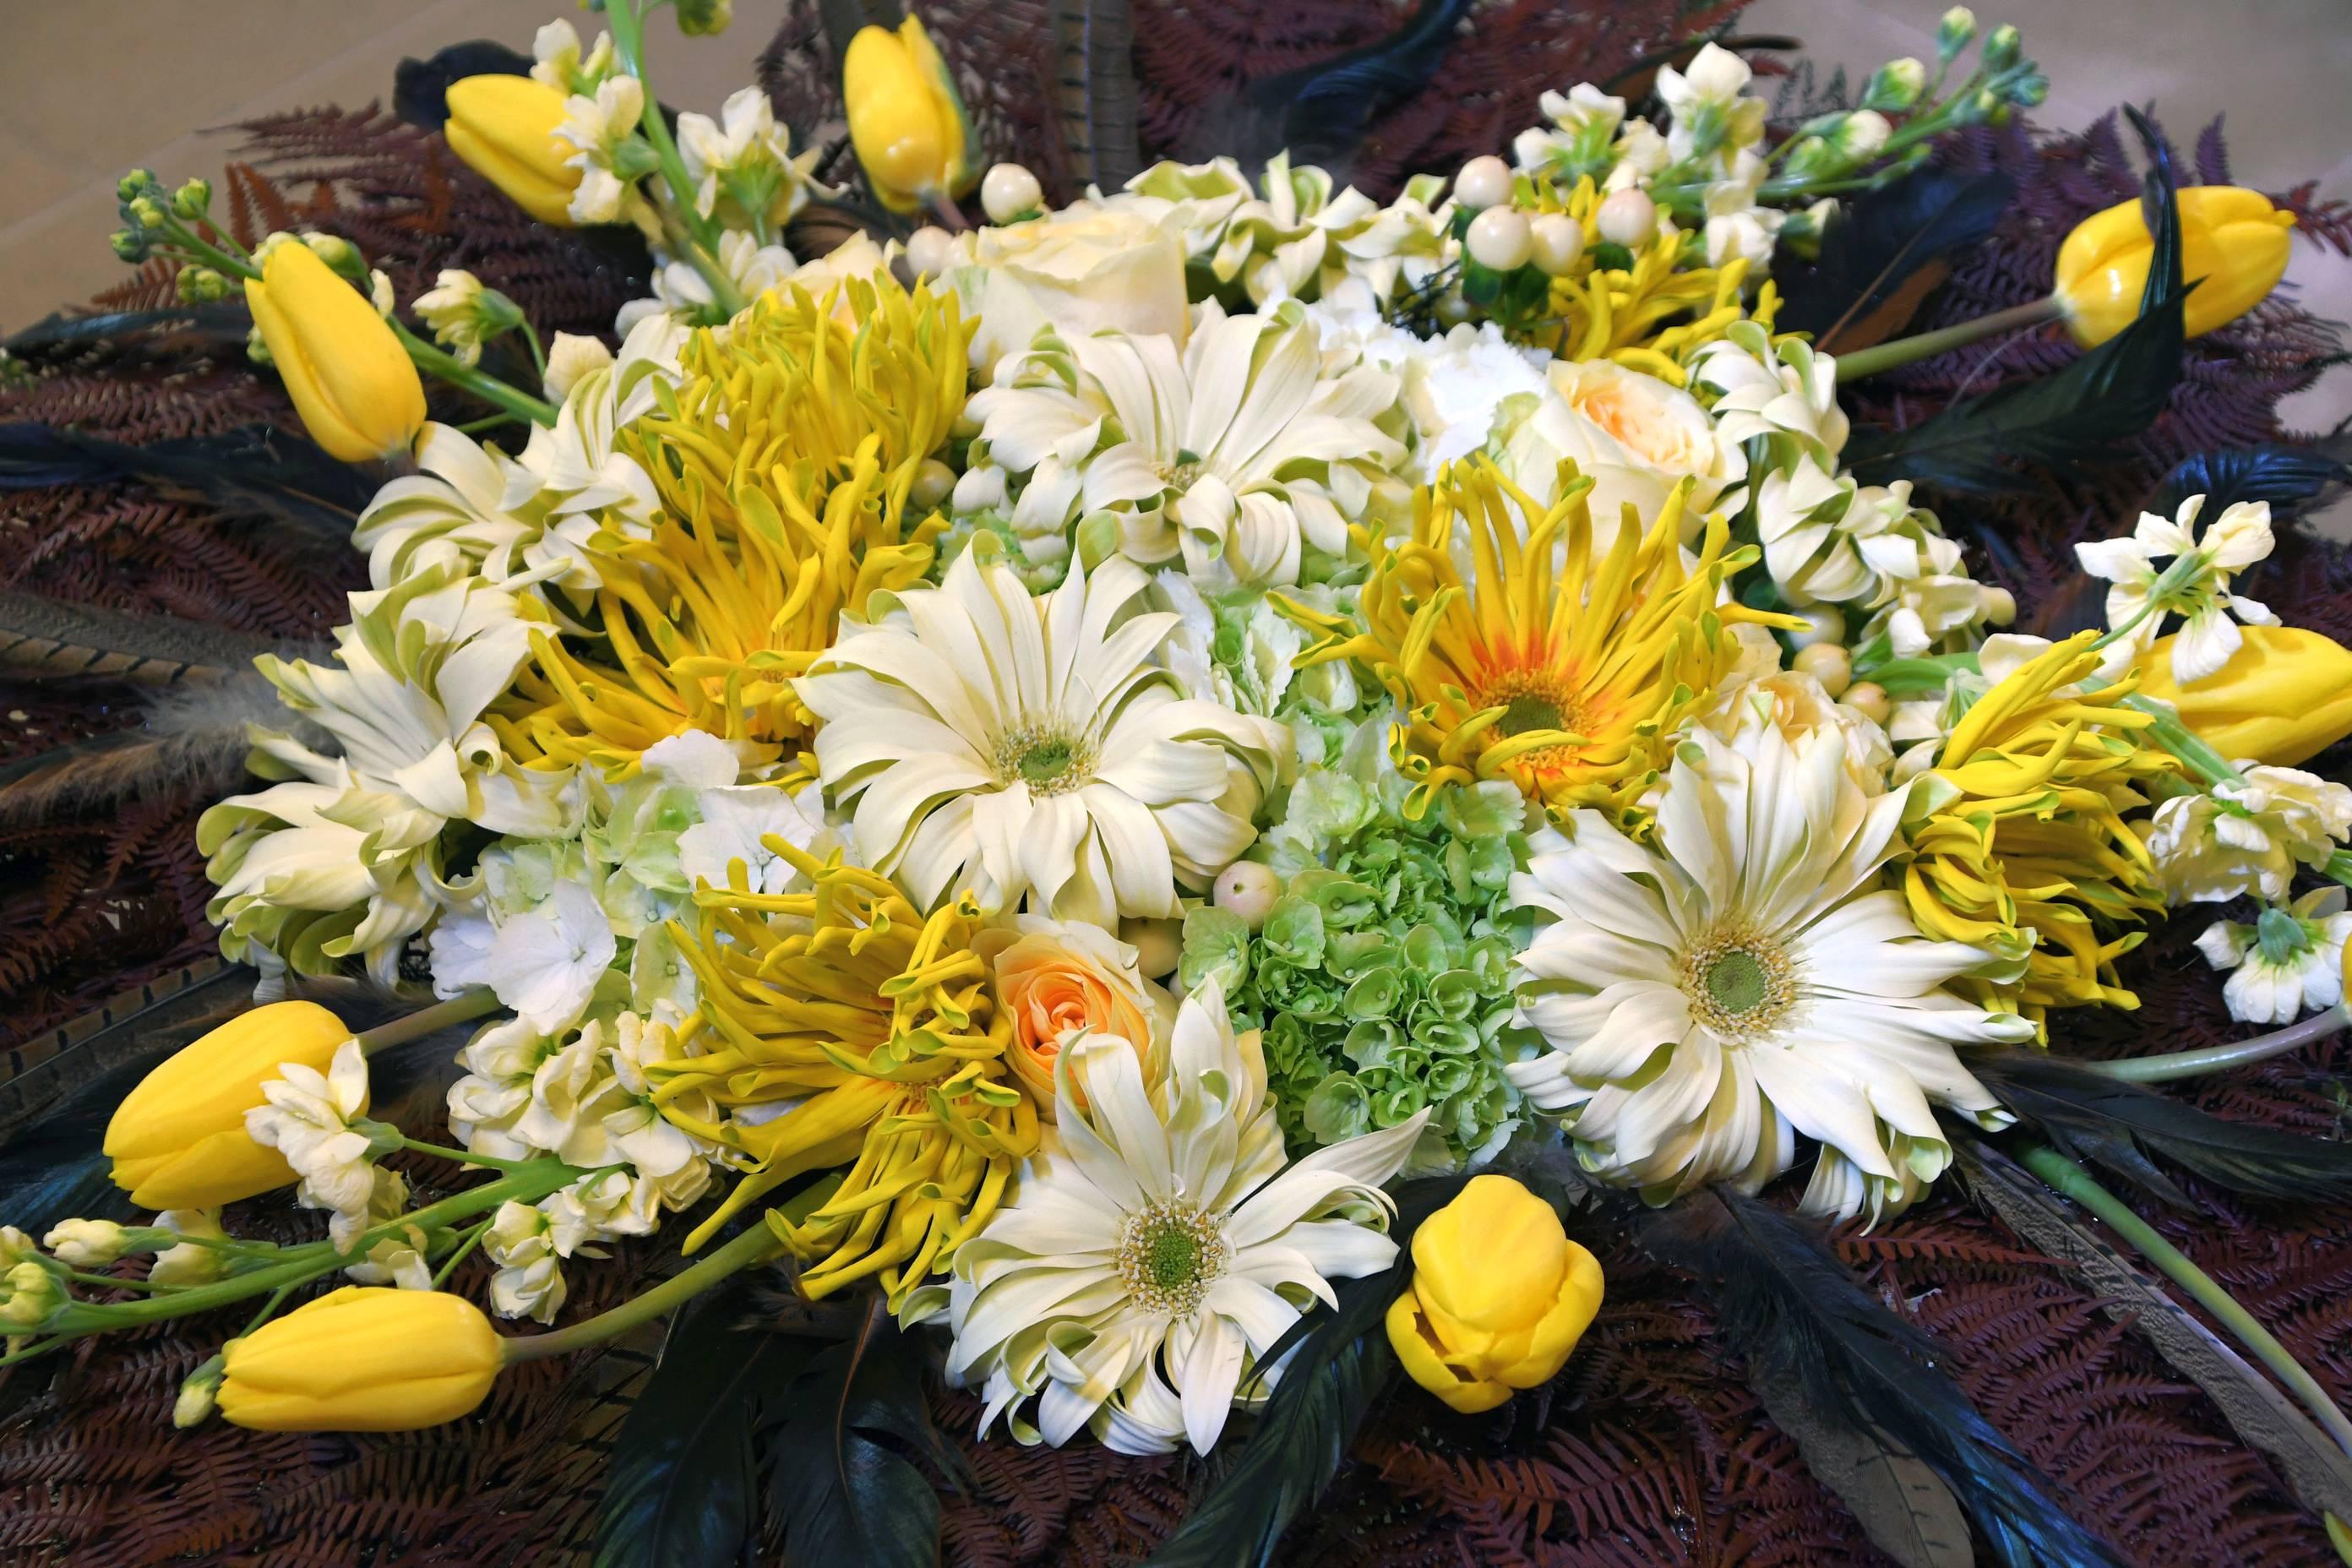 Flora Hungaria Nagybani Virágpiac bemutató